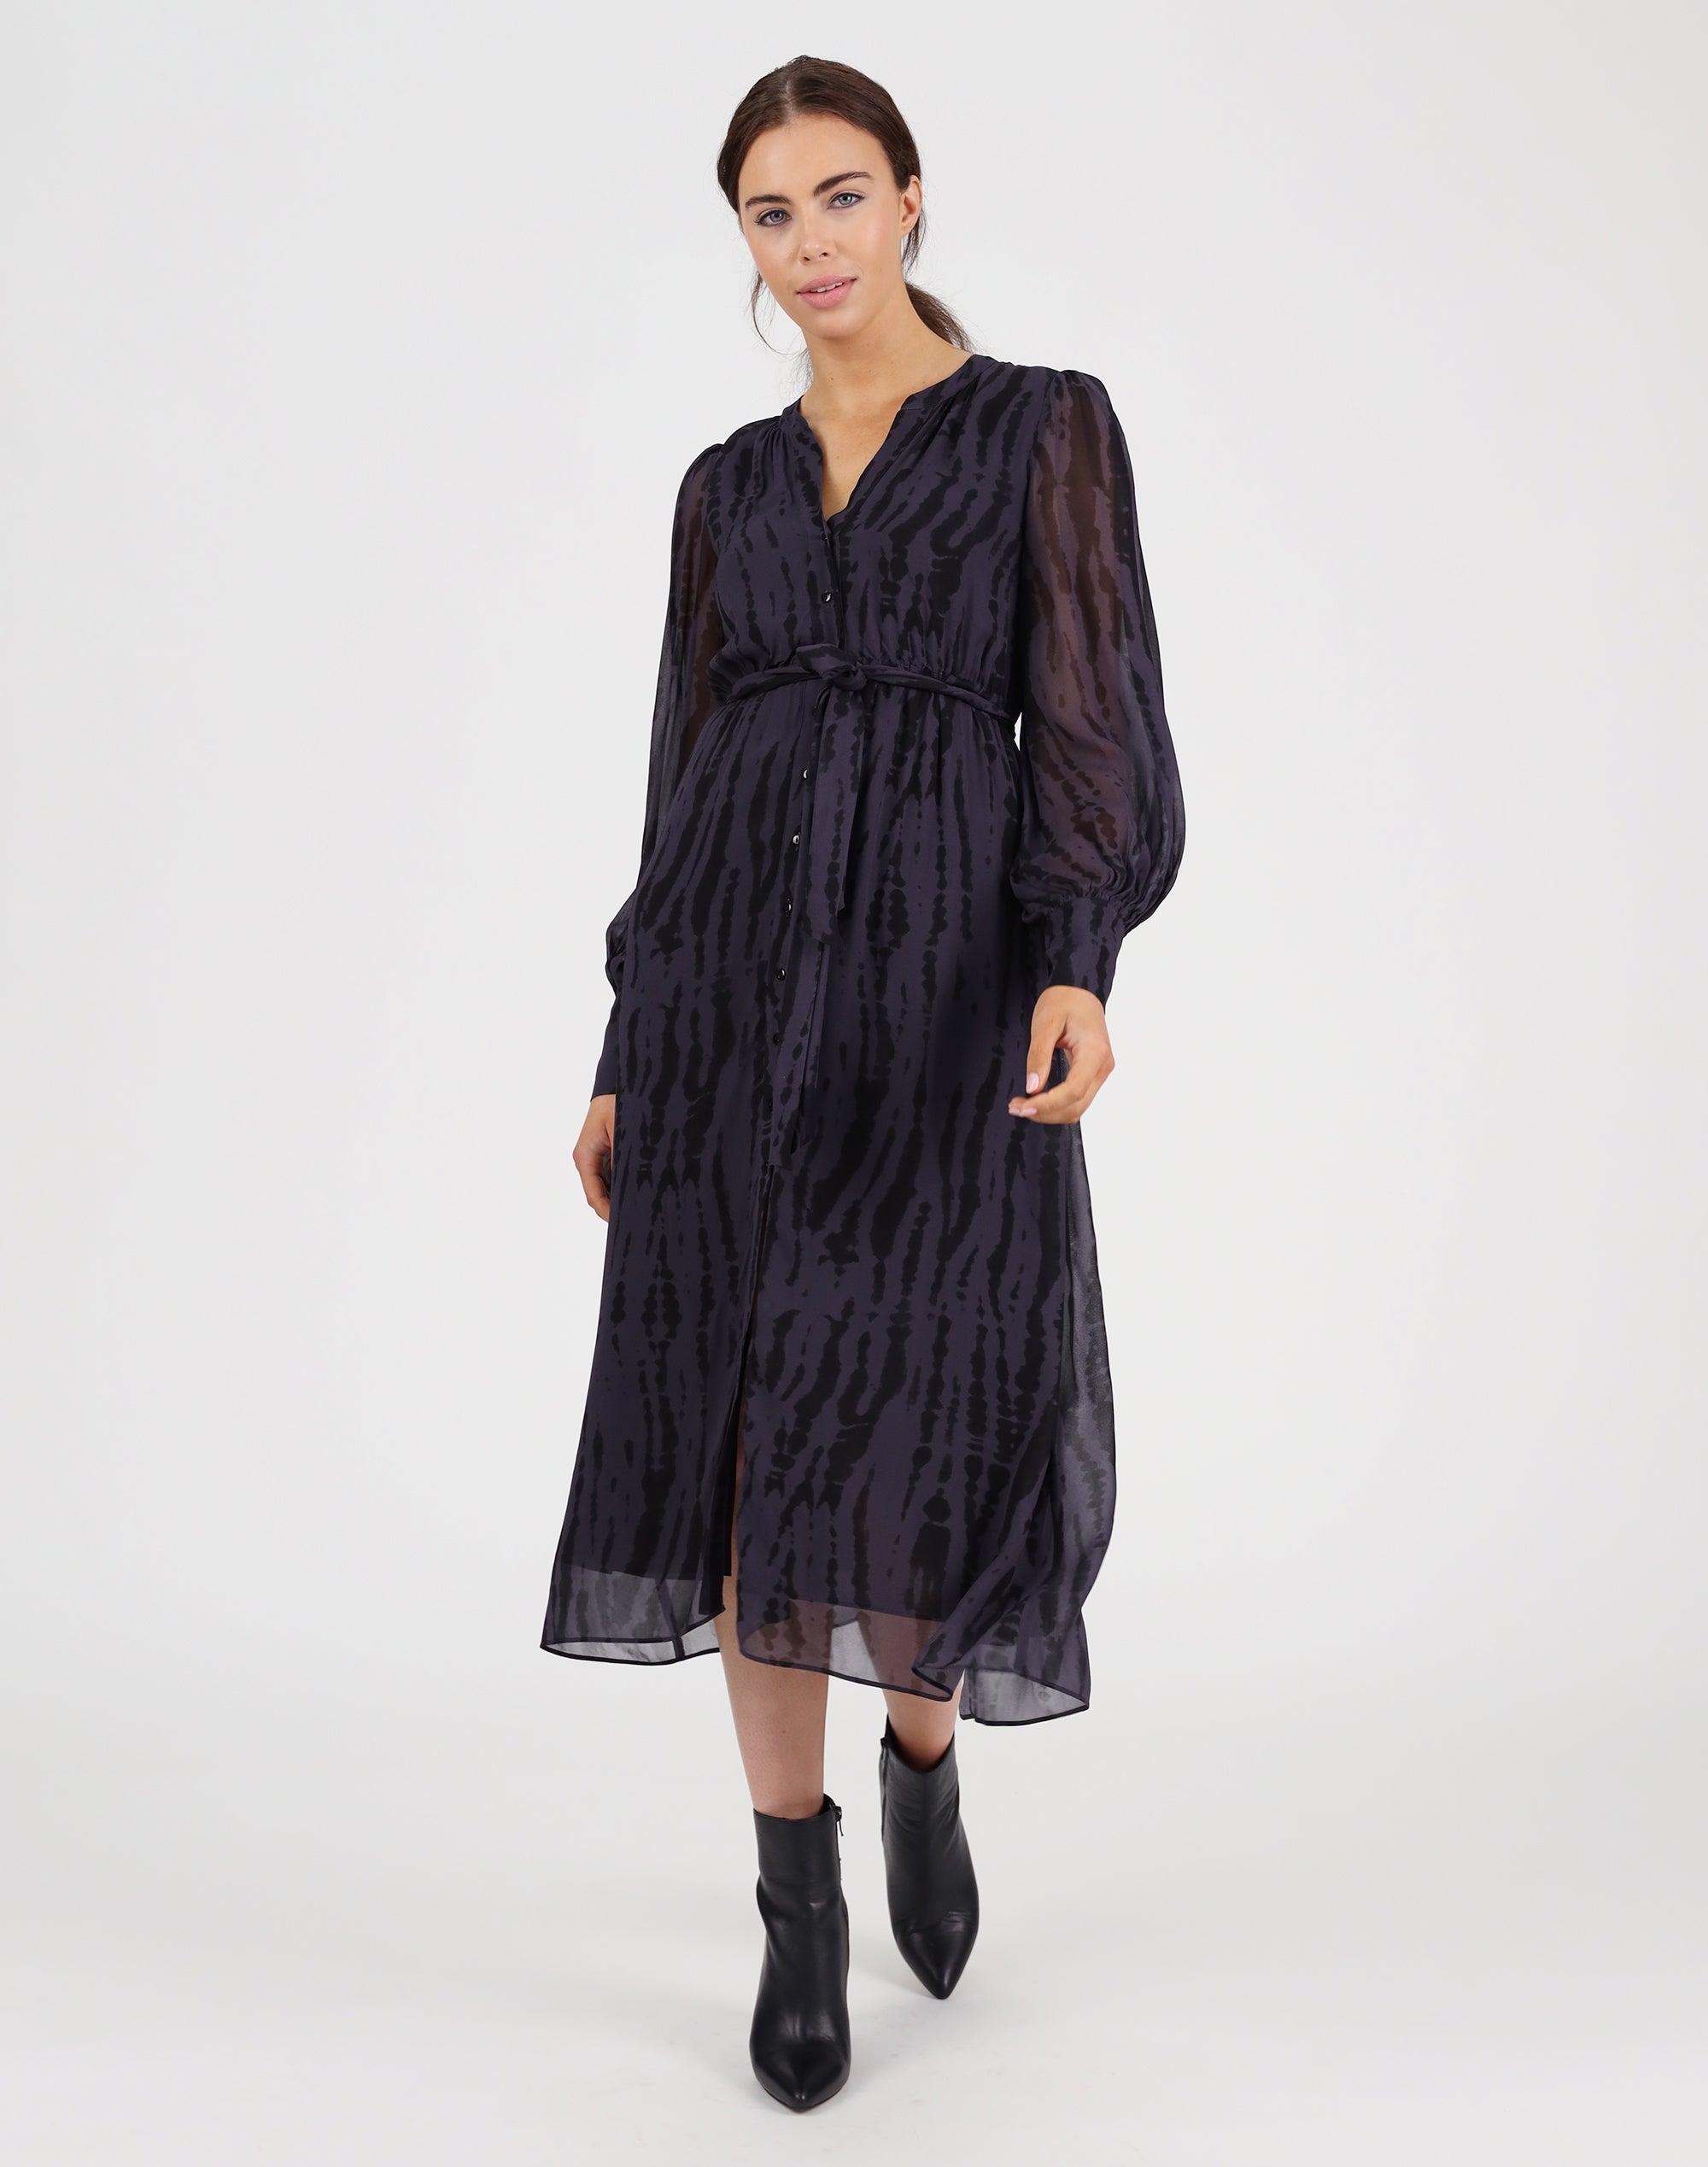 Venice Print Dress